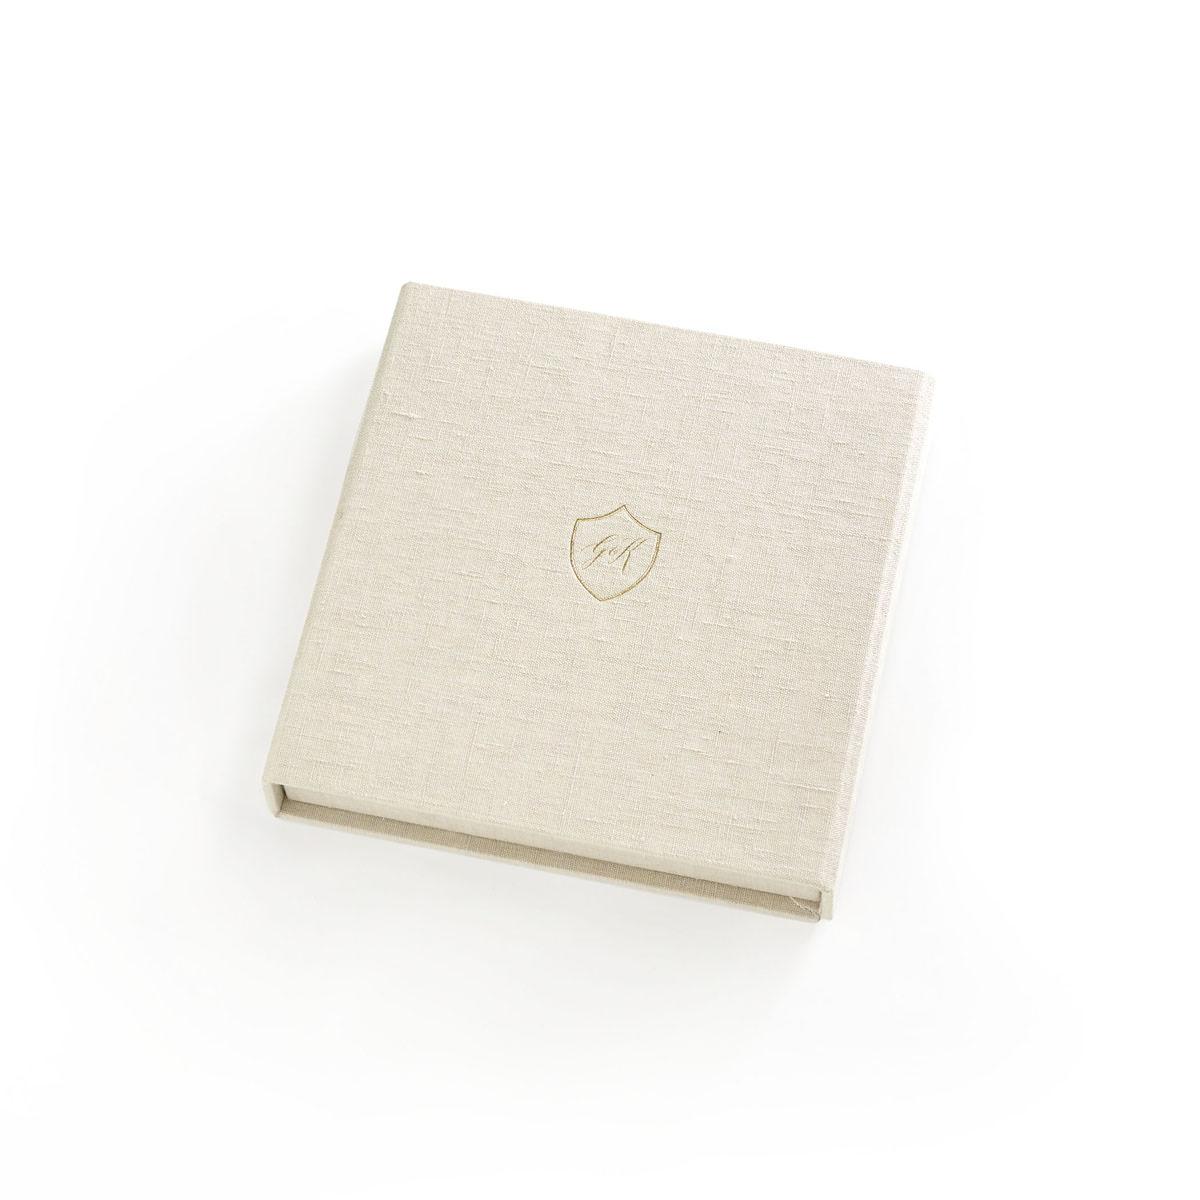 fabric_box_04.jpg